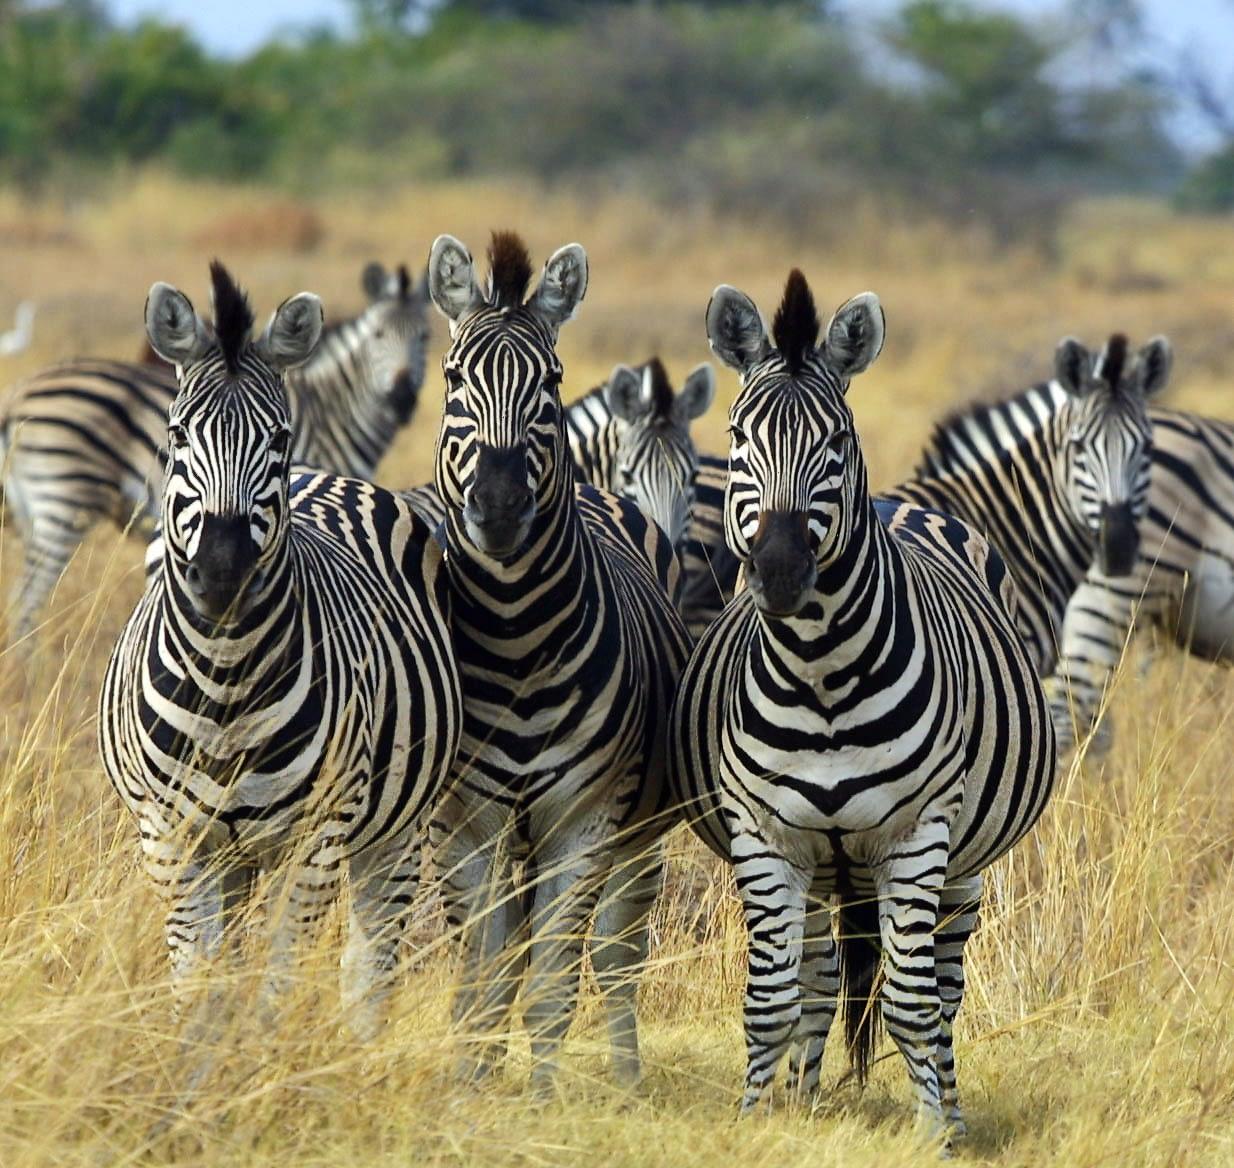 Black and White Zebras